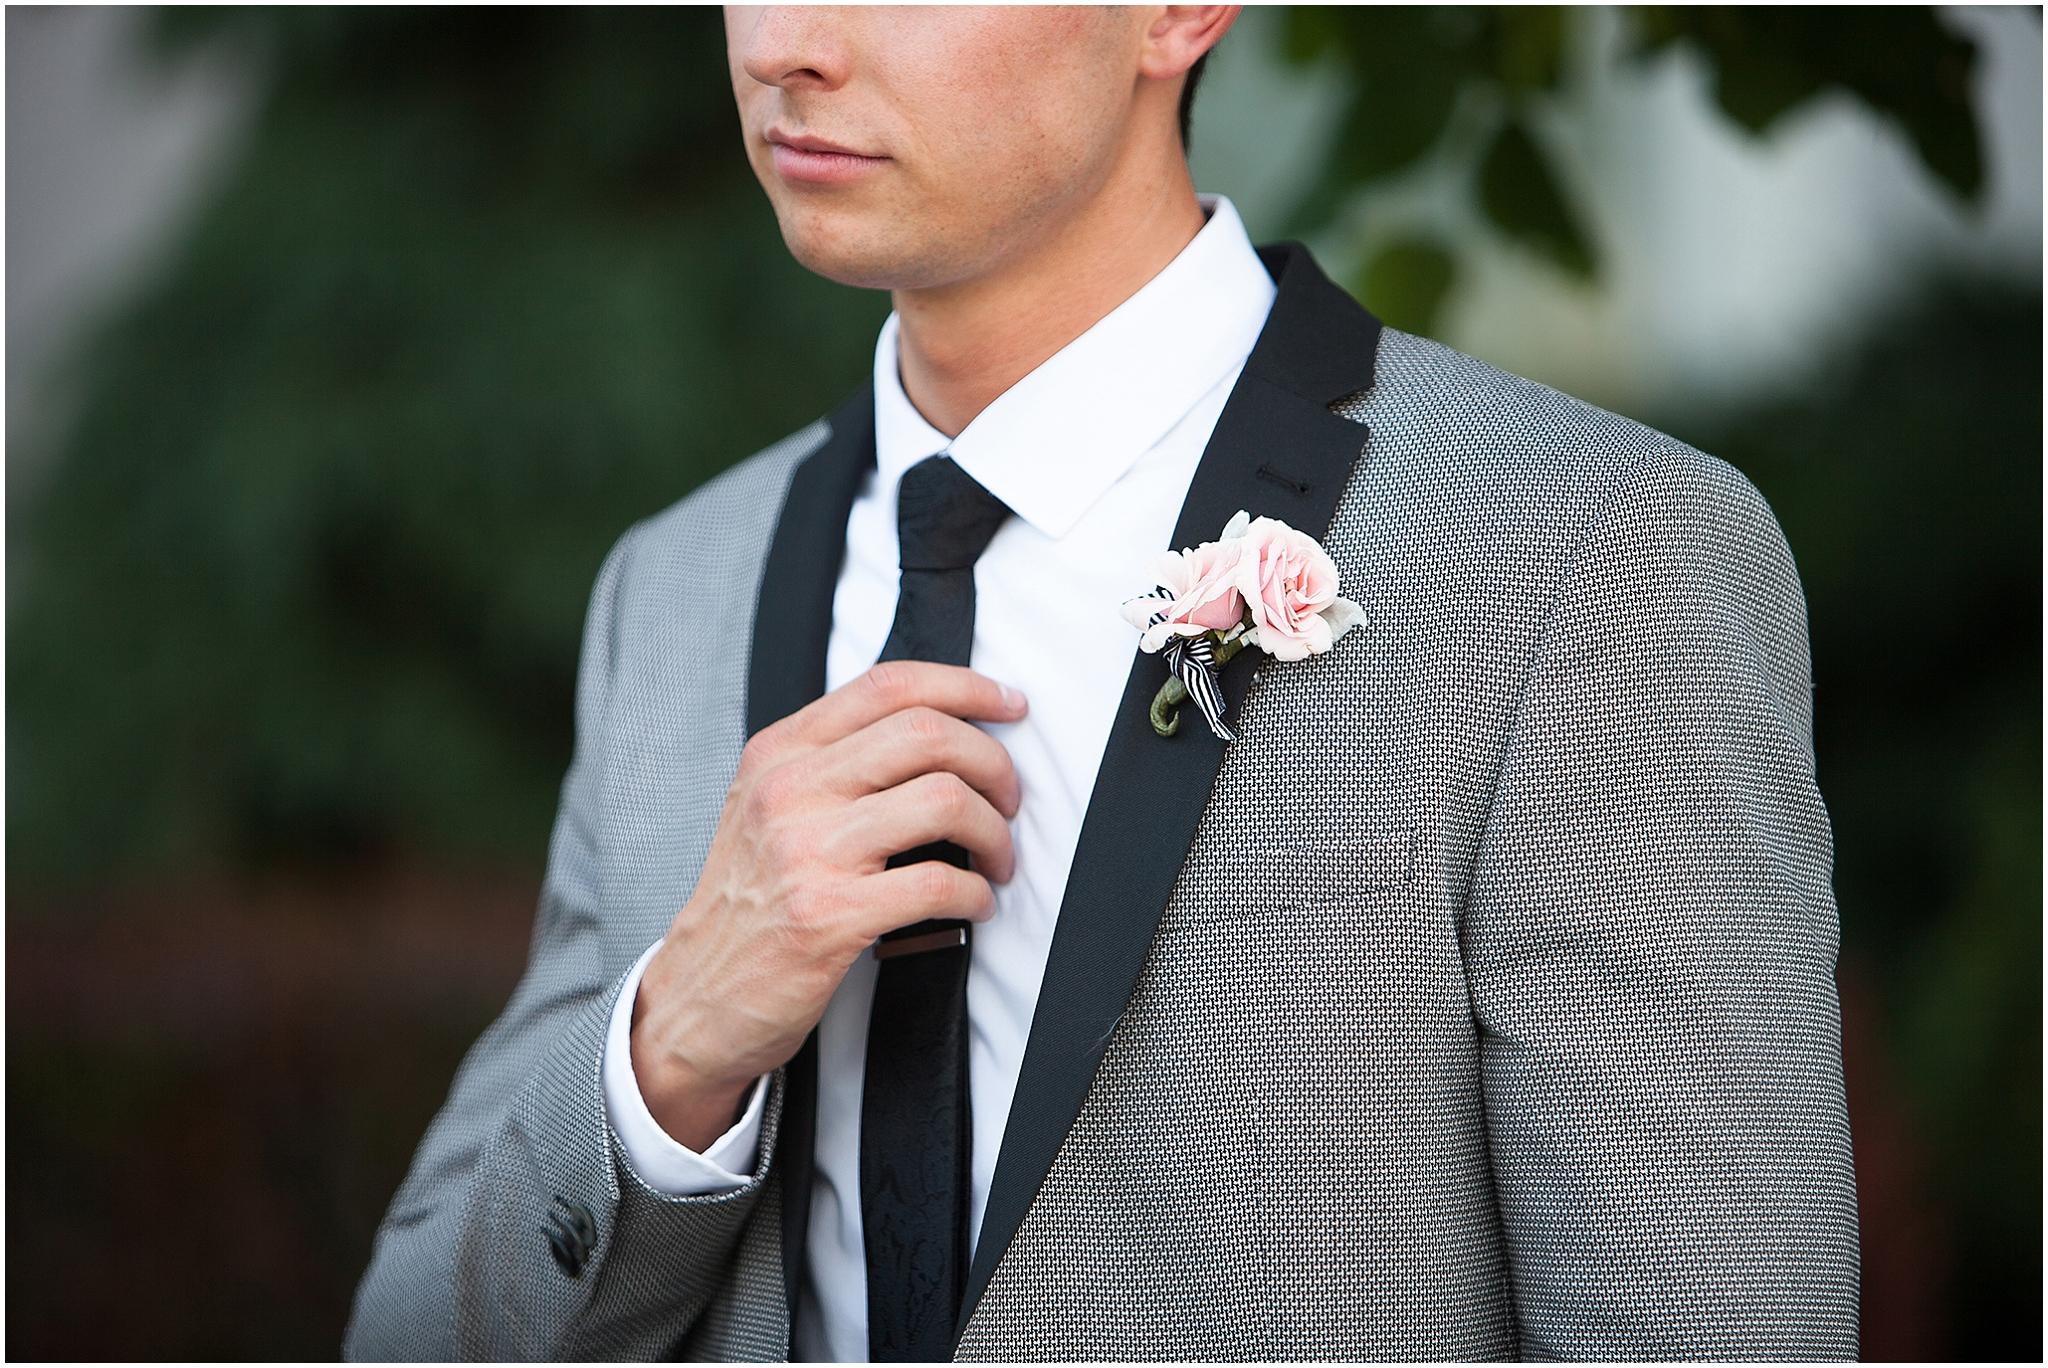 IMG_9993-Edit-99_Lizzie-B-Imagery-Utah-Wedding-Photographer-Salt-Lake-City-Park-City-timpanogos-Utah-Temple.jpg